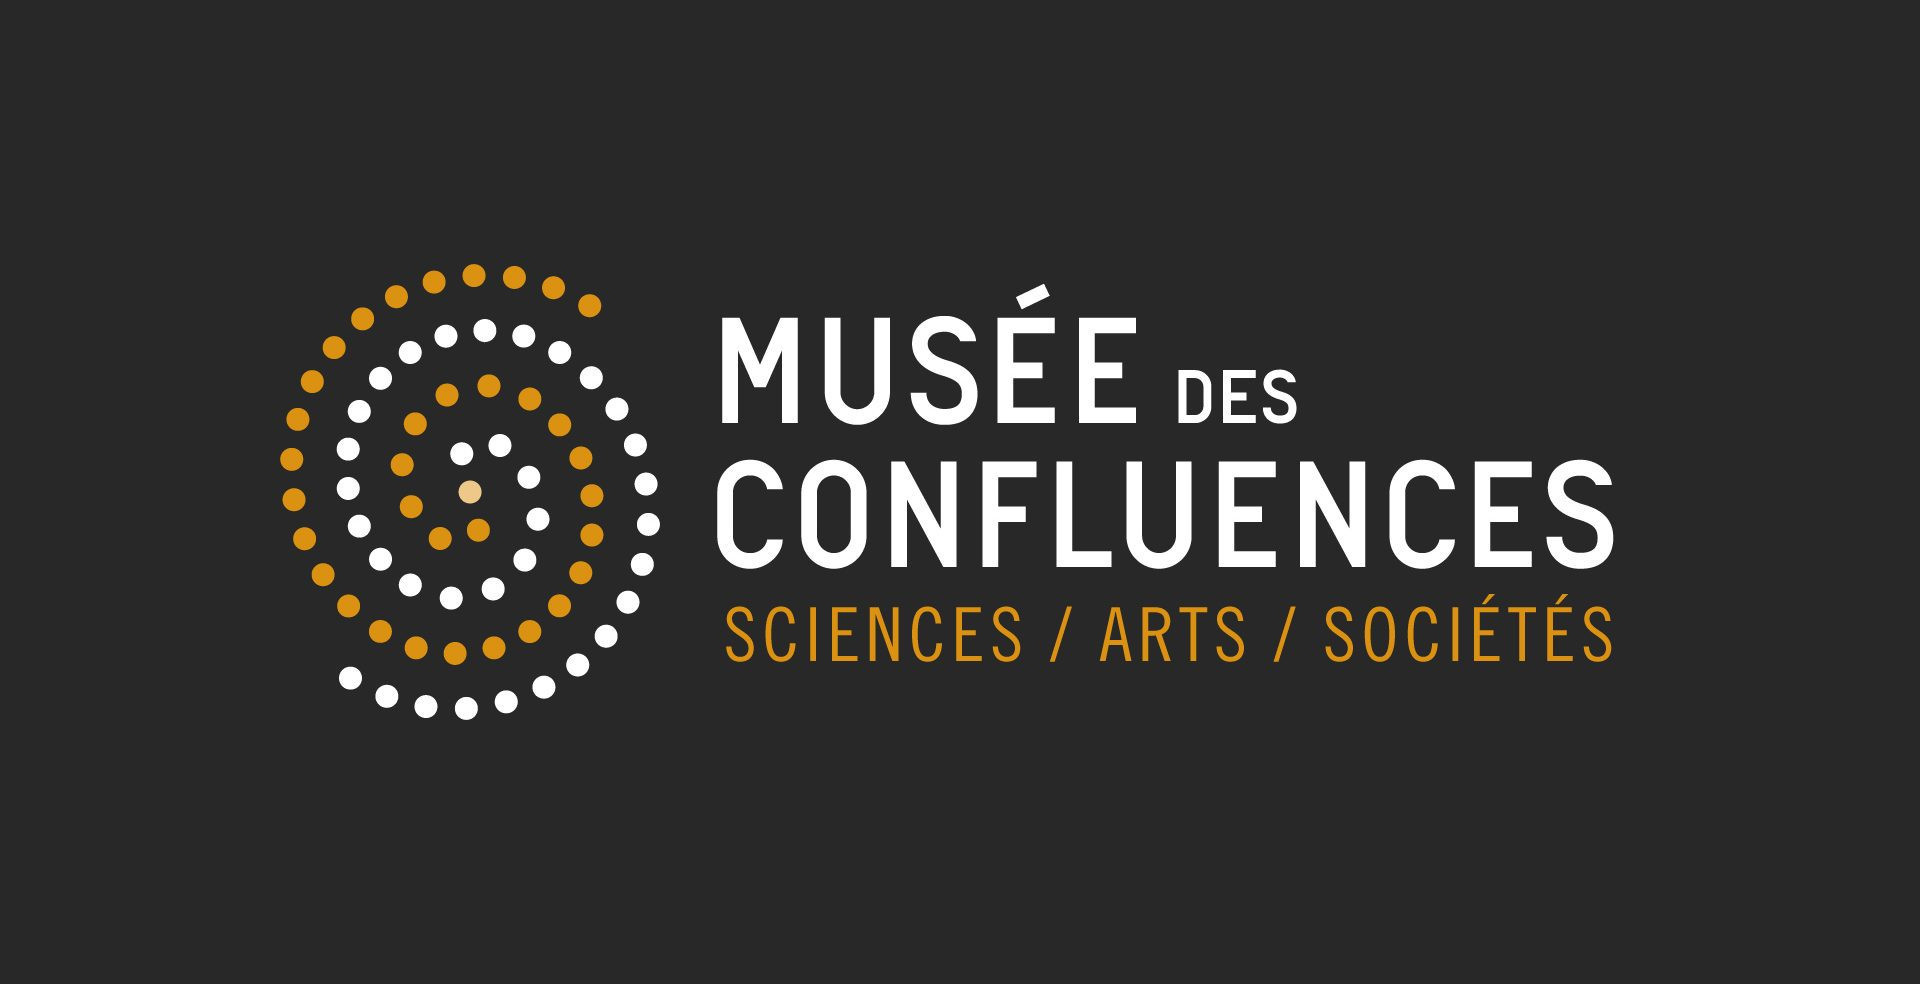 musee-des-confluences.jpg